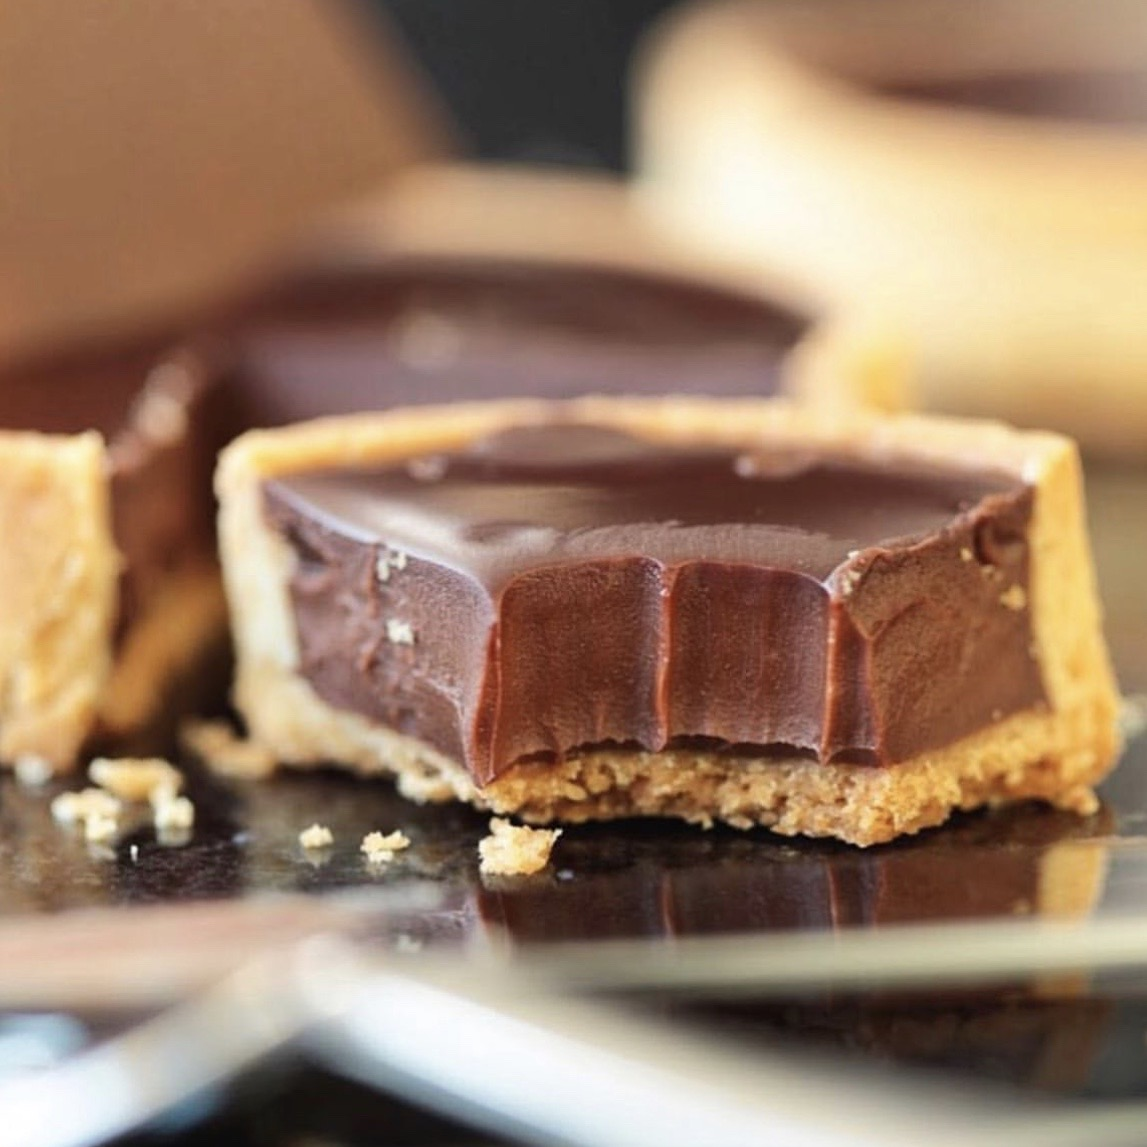 LUXURIOUS CHOCOLATE TART